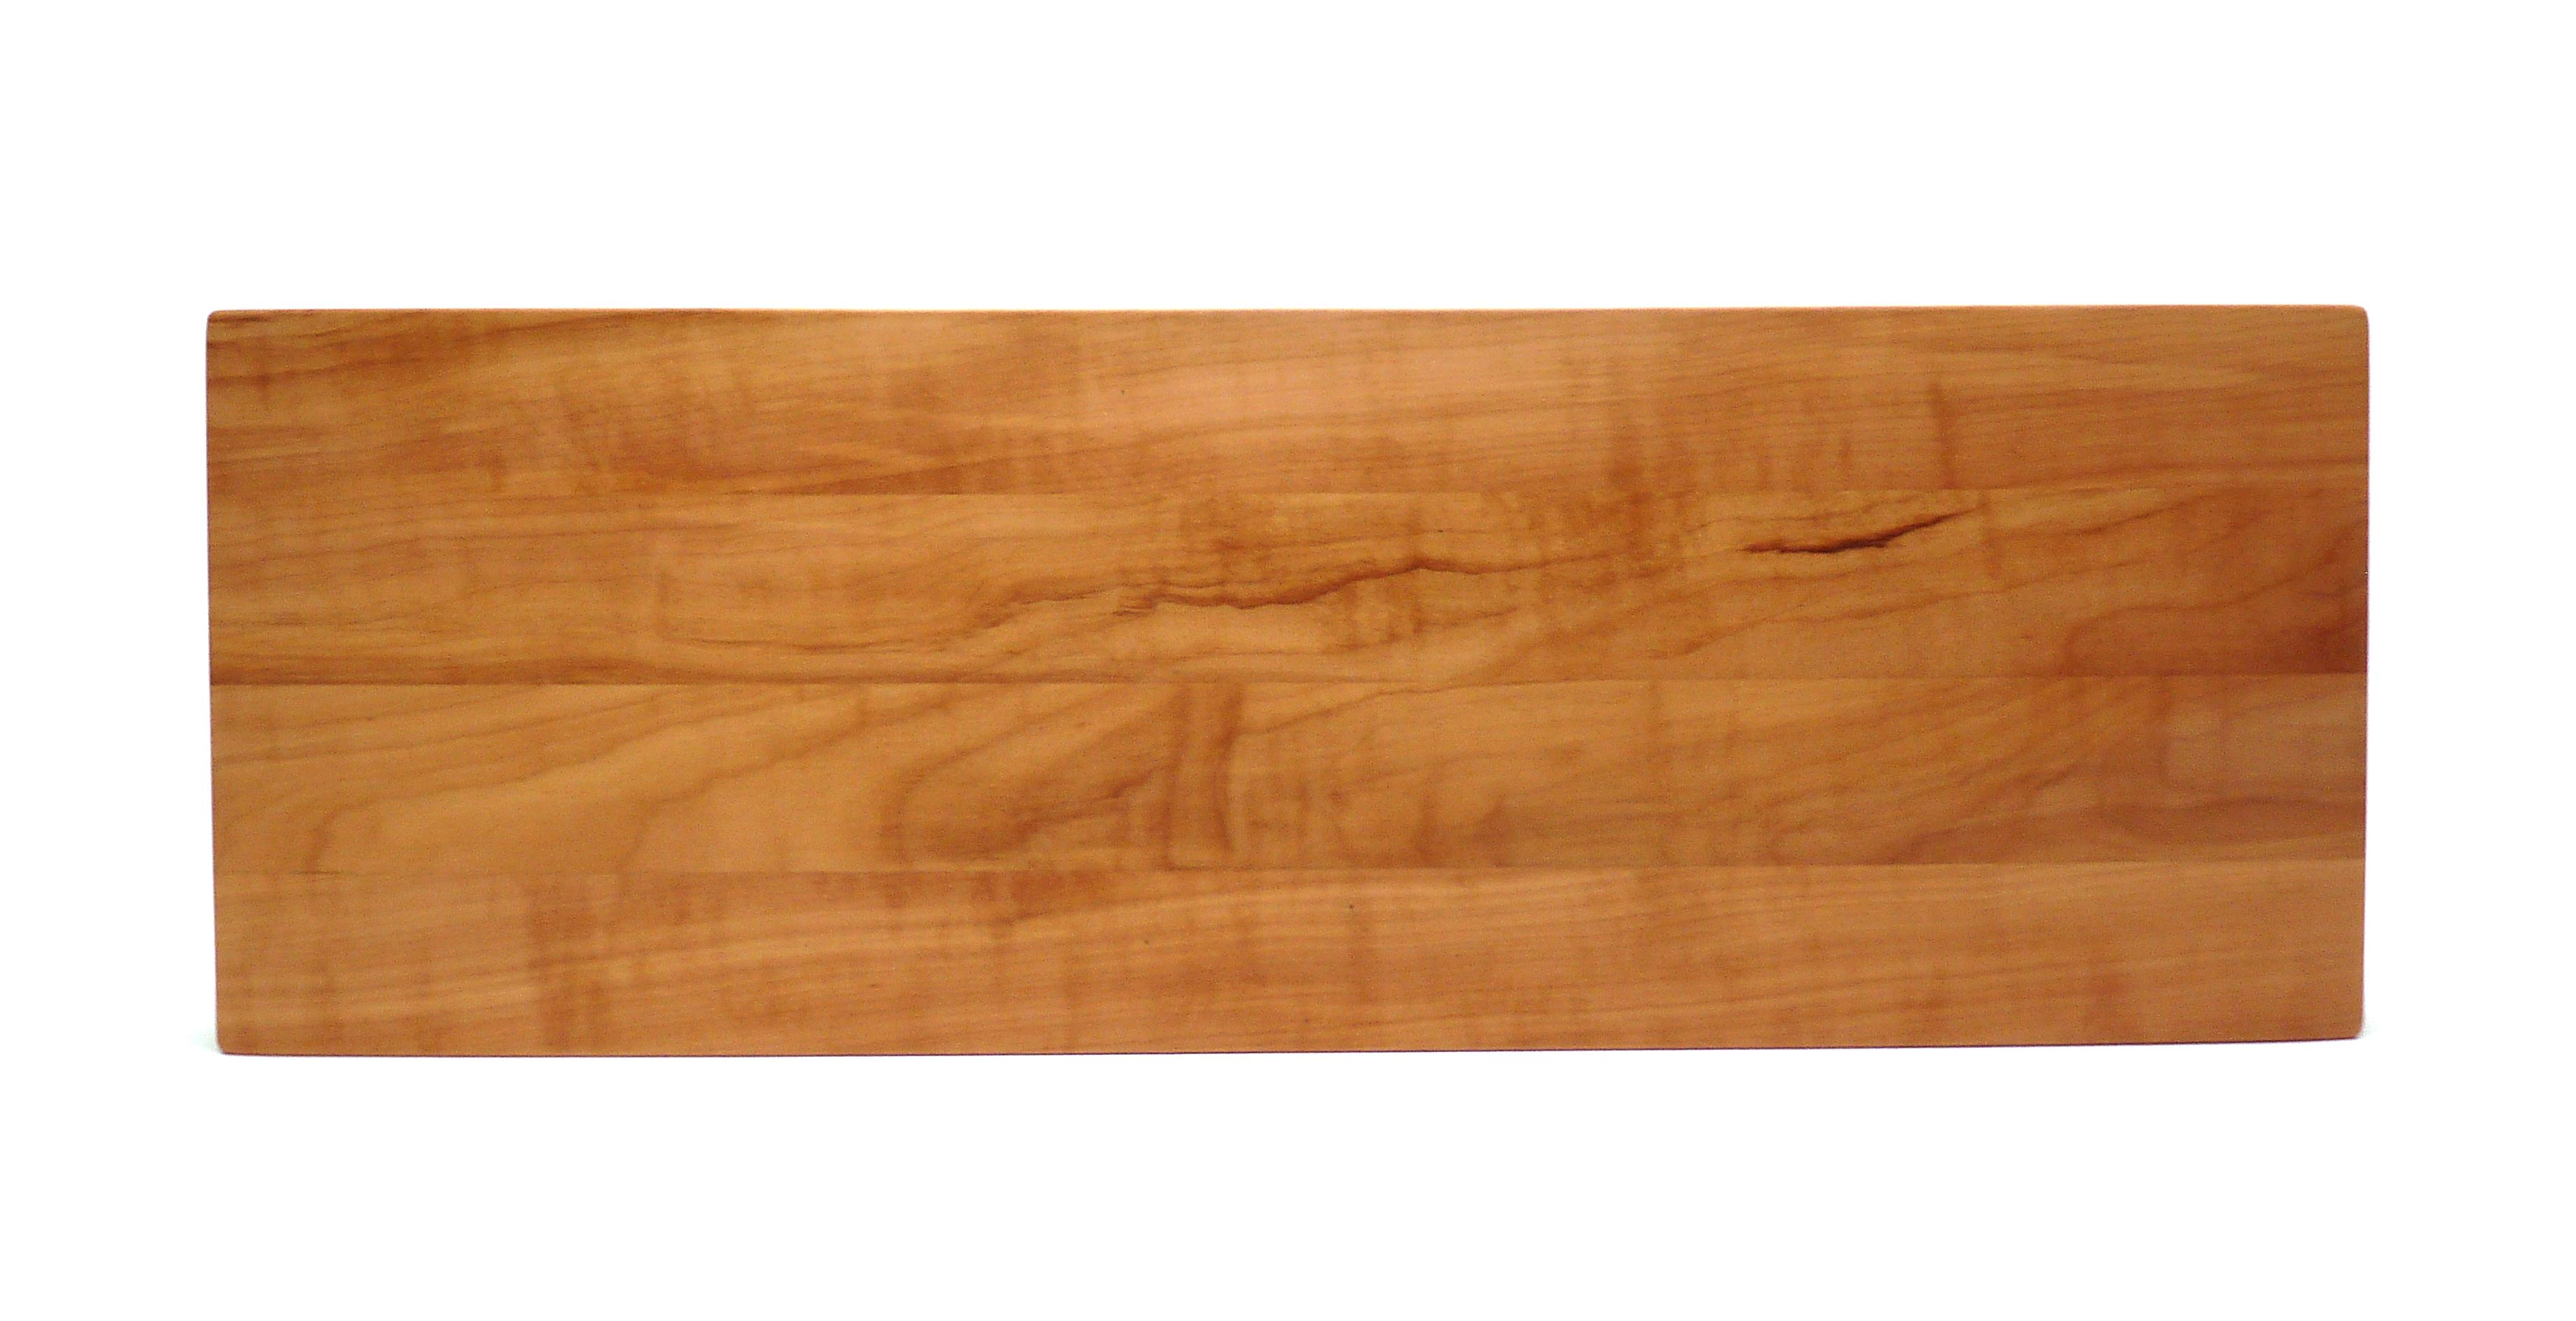 Planke Birnbaum